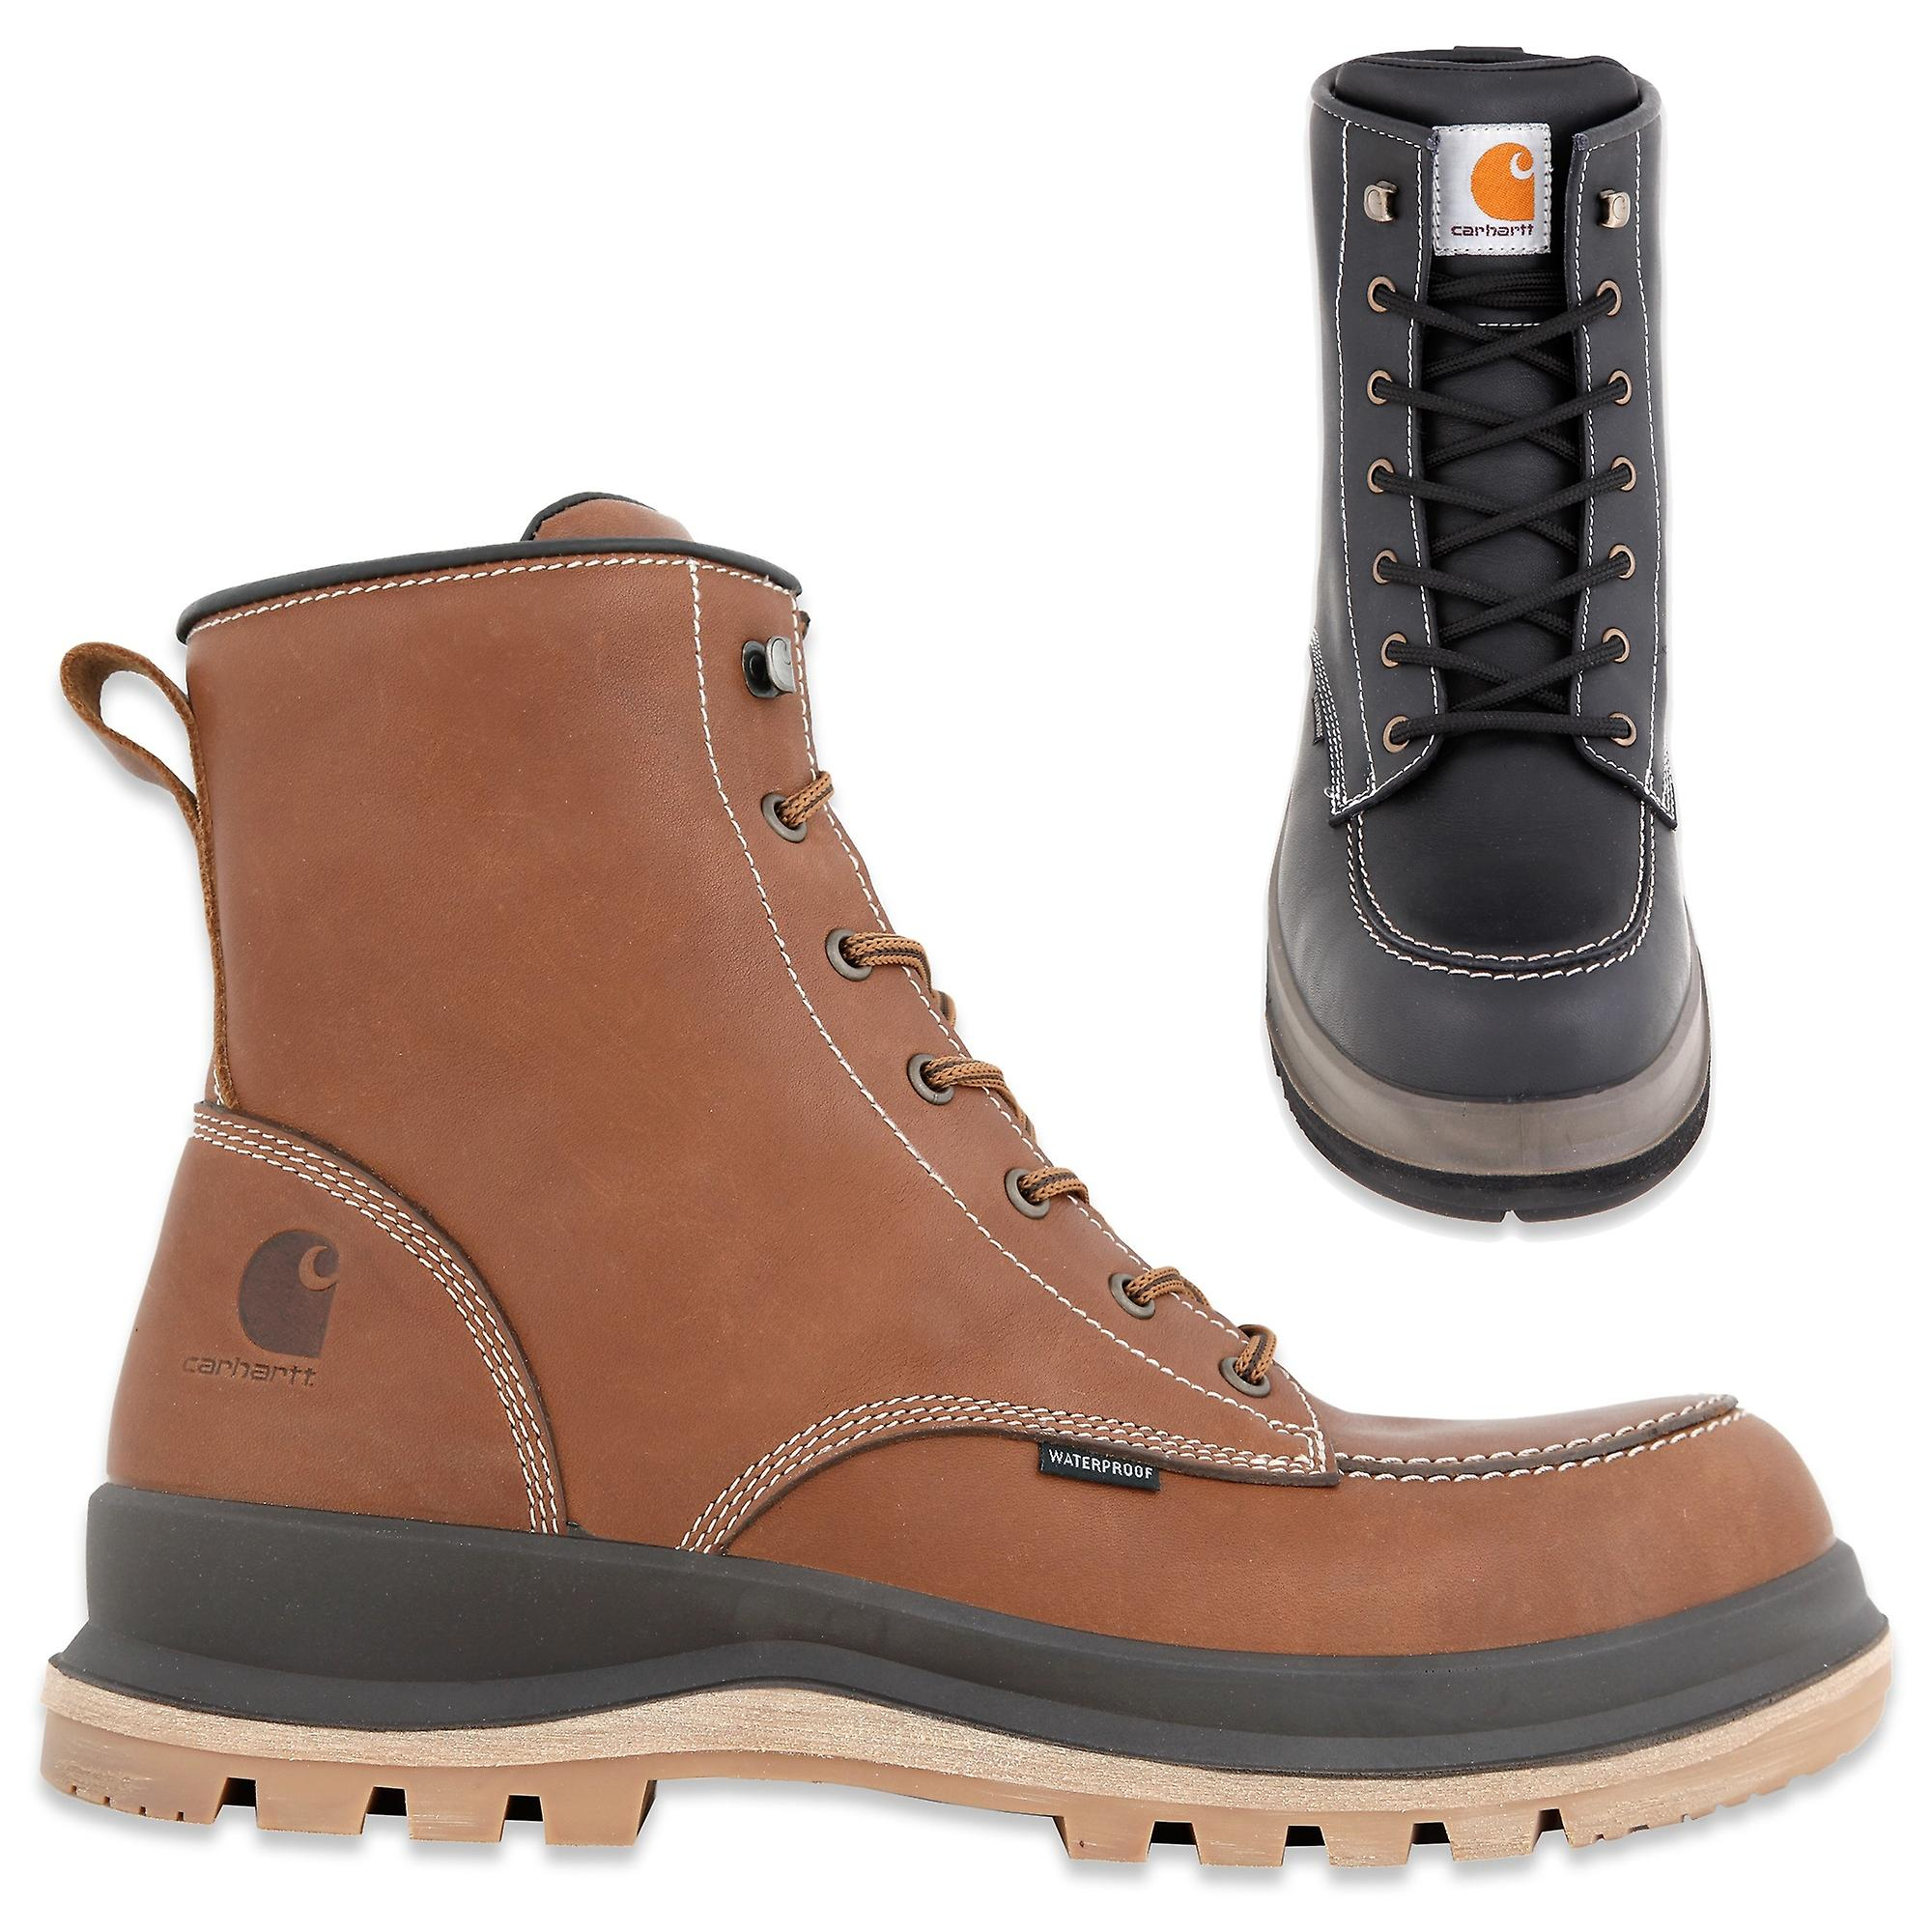 6edfb449136 Carhartt men's work boots Hamilton rugged Flex S3, height 6 '